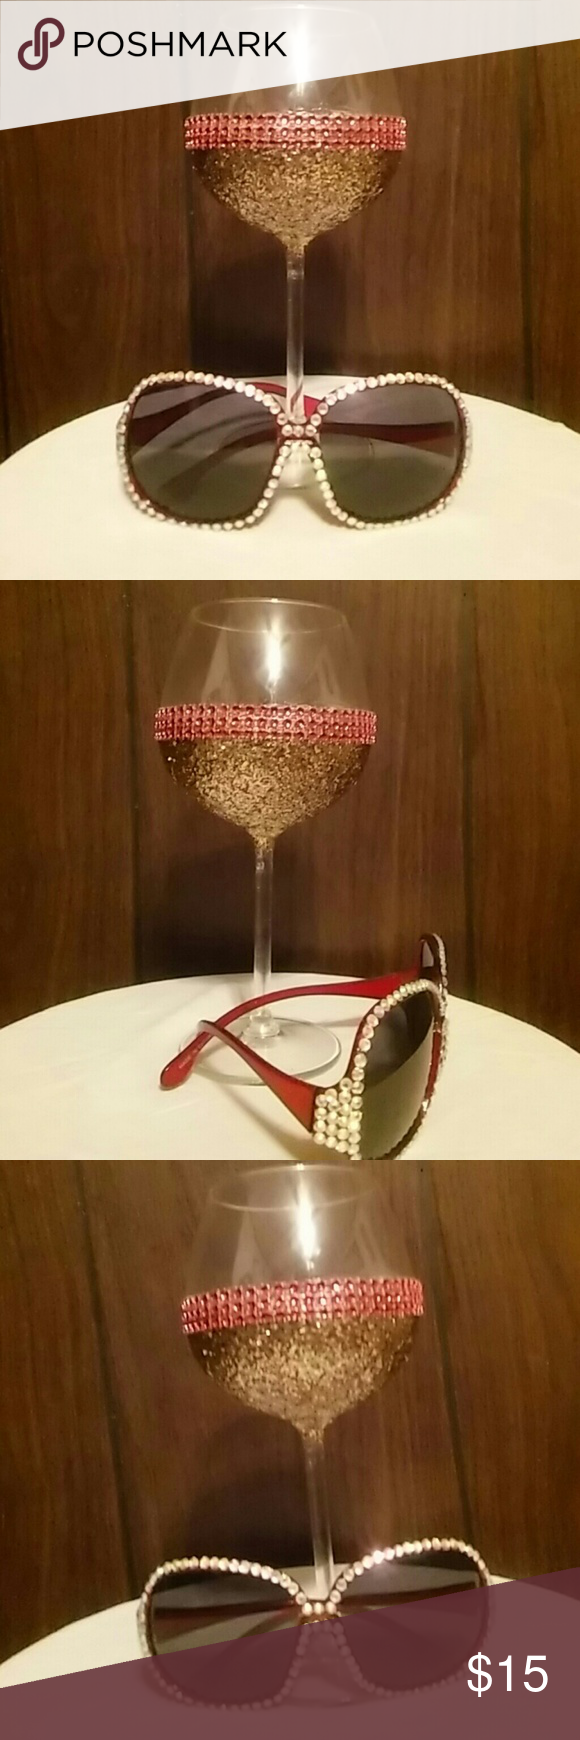 Sunglasses Swarovski crystal inspired sunglasses Accessories Glasses